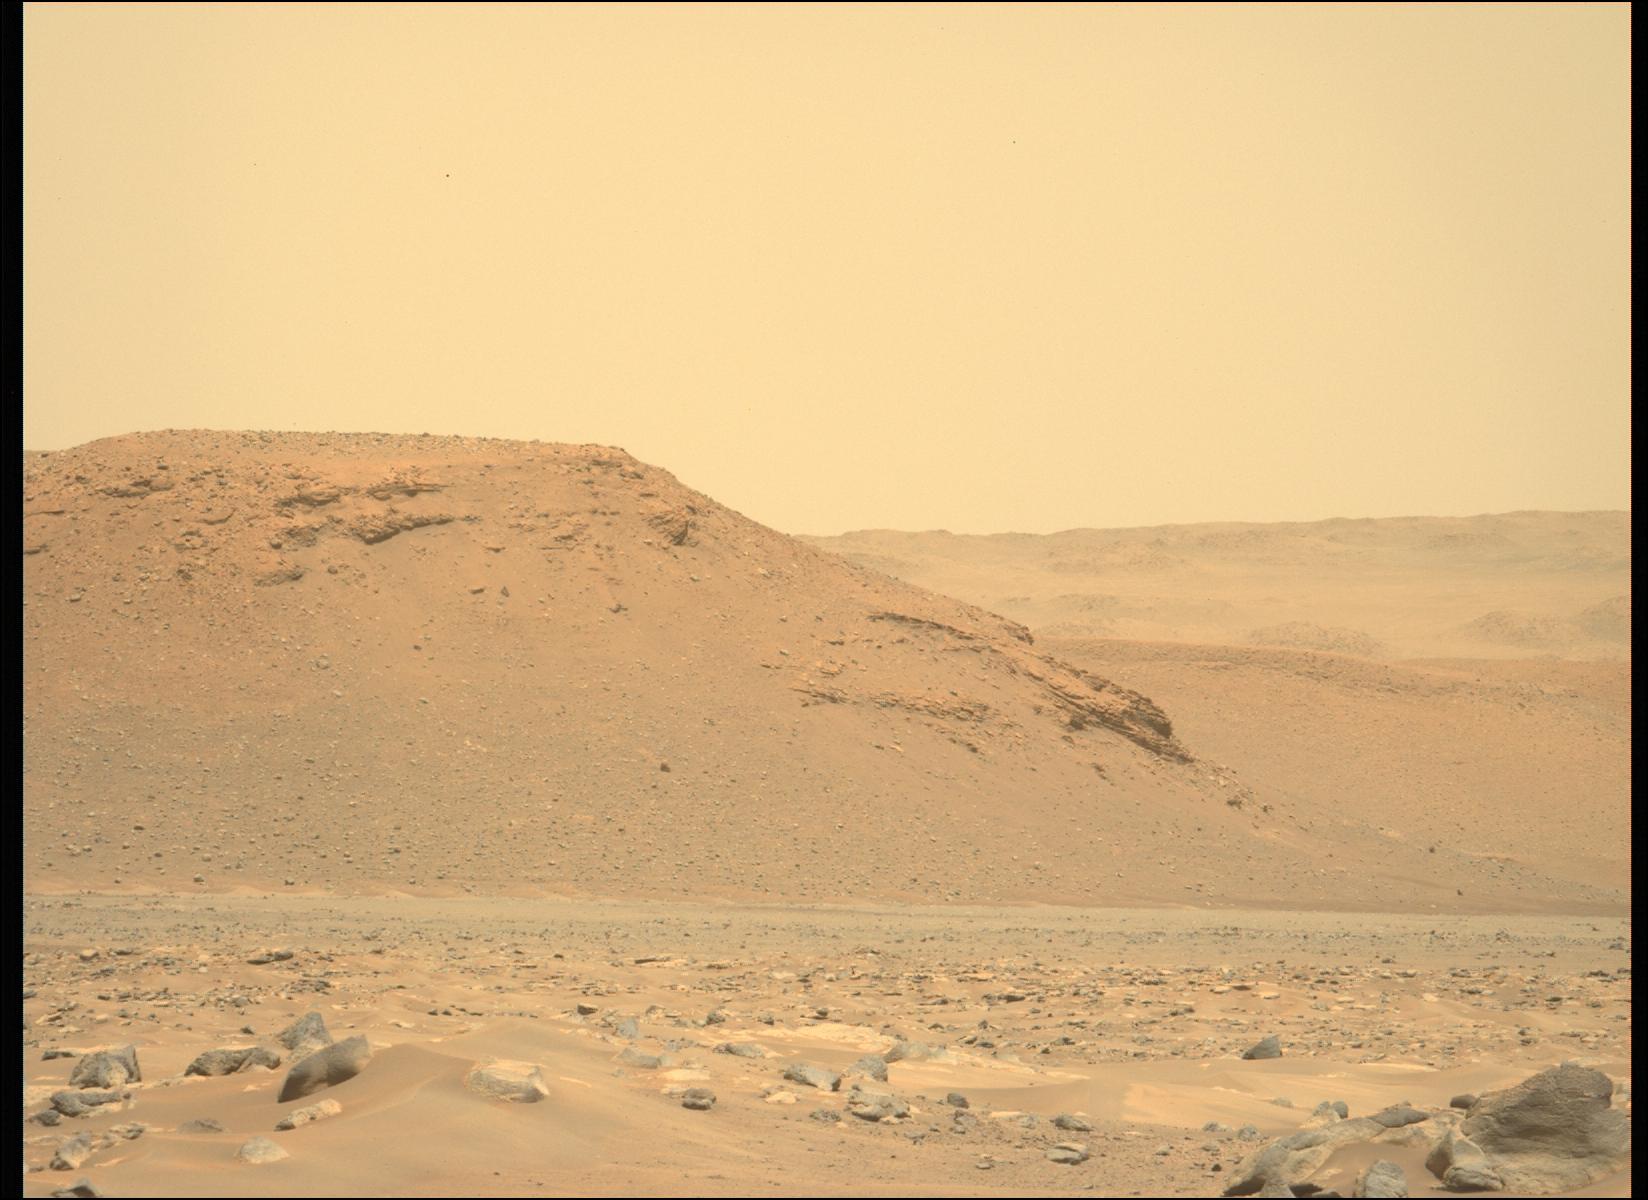 Mars_Perseverance_ZLF_0026_0669245431_186FDR_N0030792ZCAM08002_1100LUJ.png